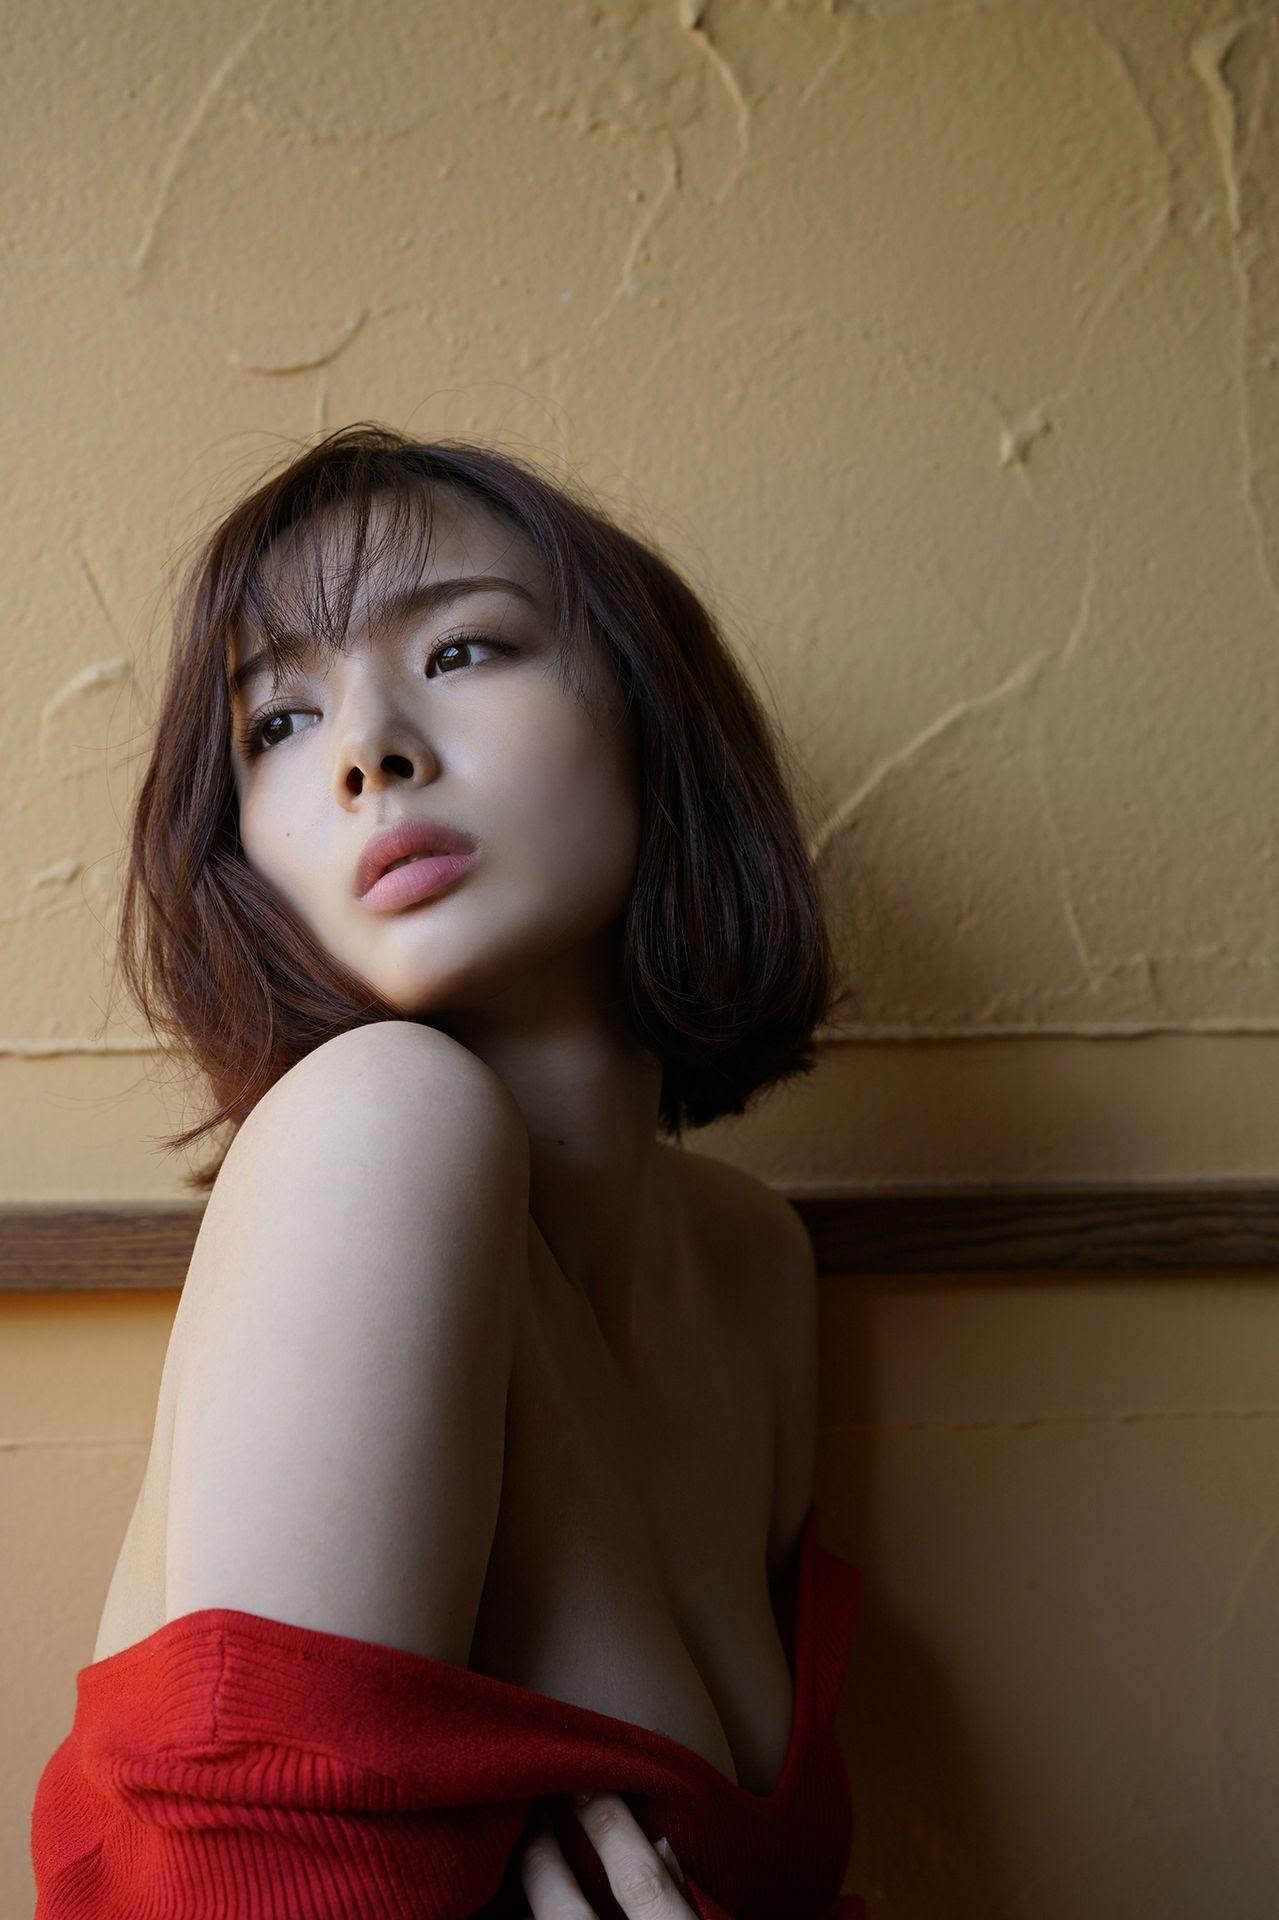 23 years old Shaka Okada, who is also a professional mahjong player042